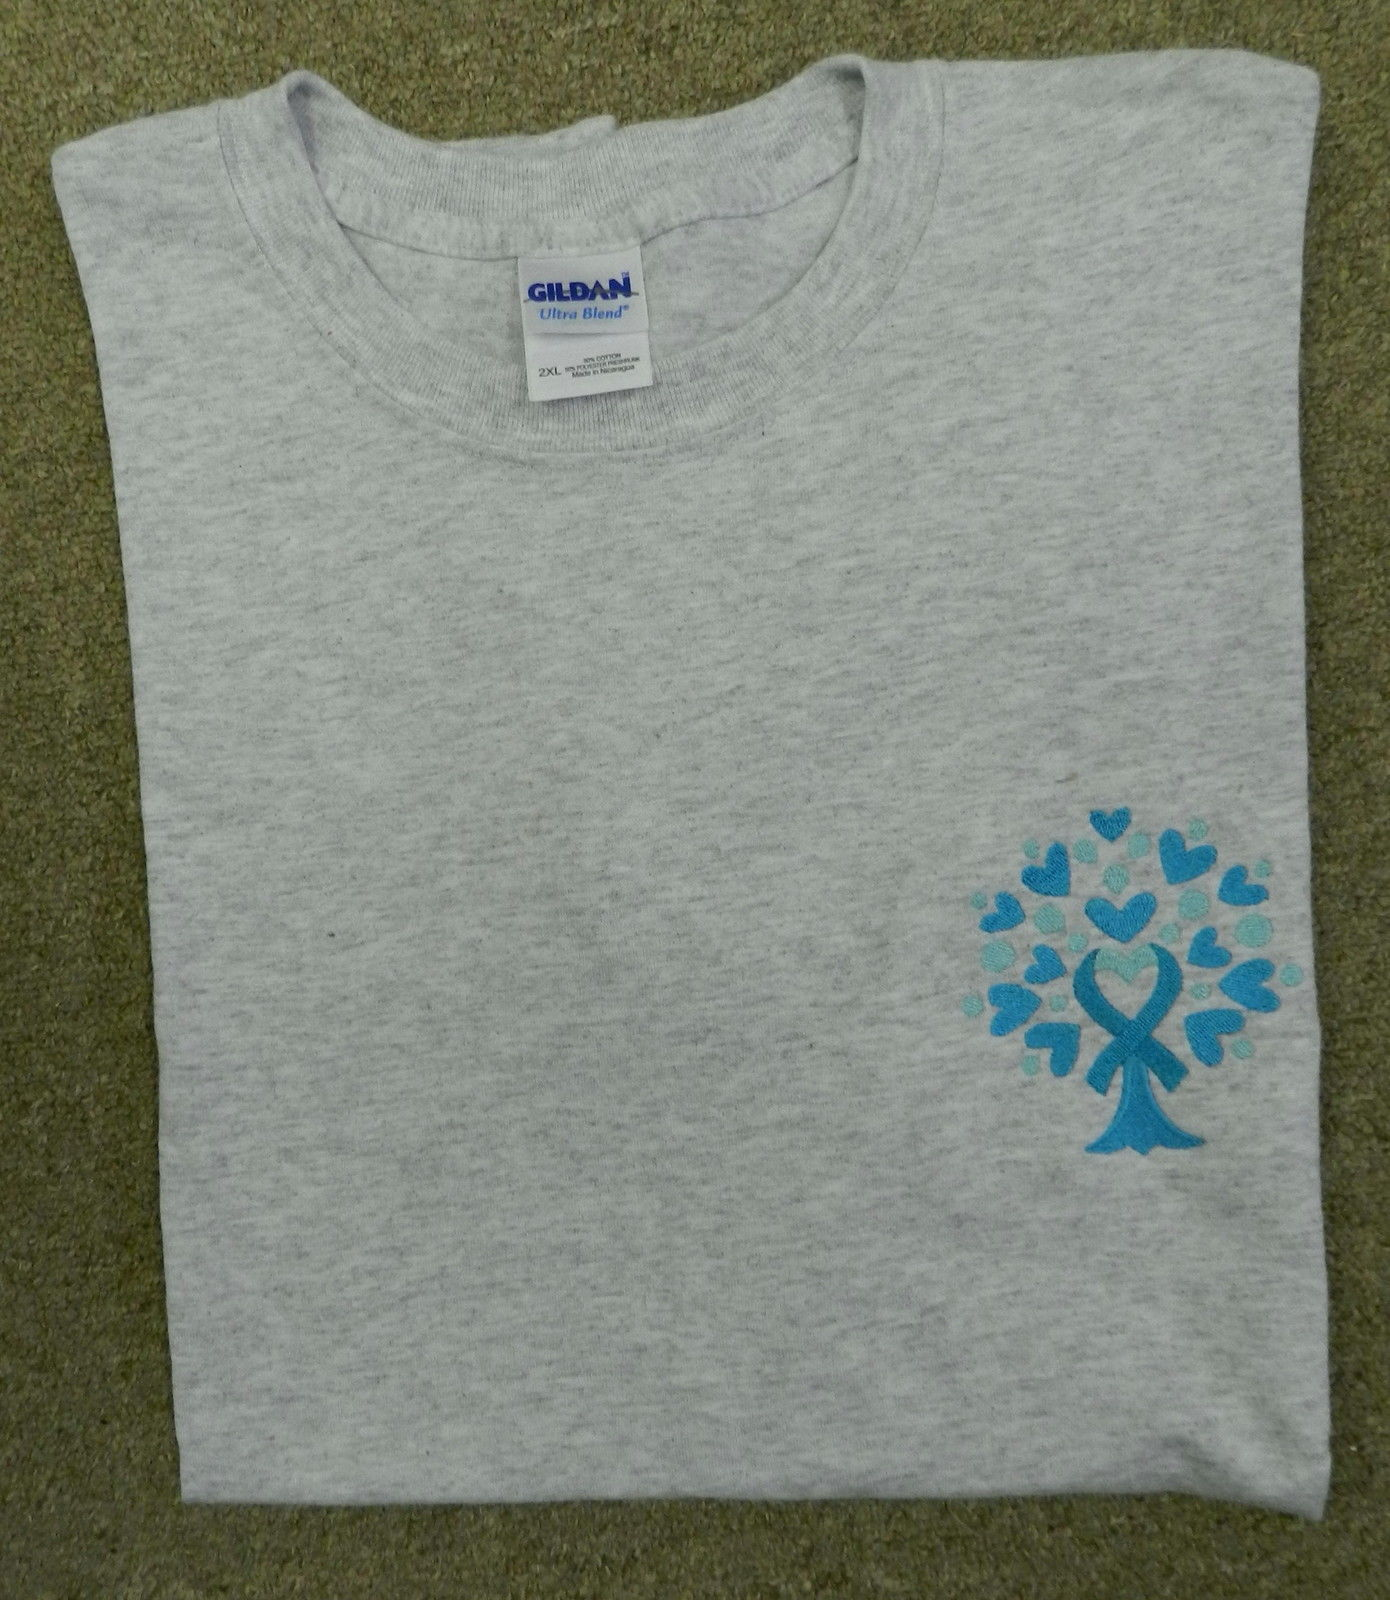 Ovarian Cancer Awareness 2XL Teal Ribbon Tree of Life Heart Gray S/S T Shirt New